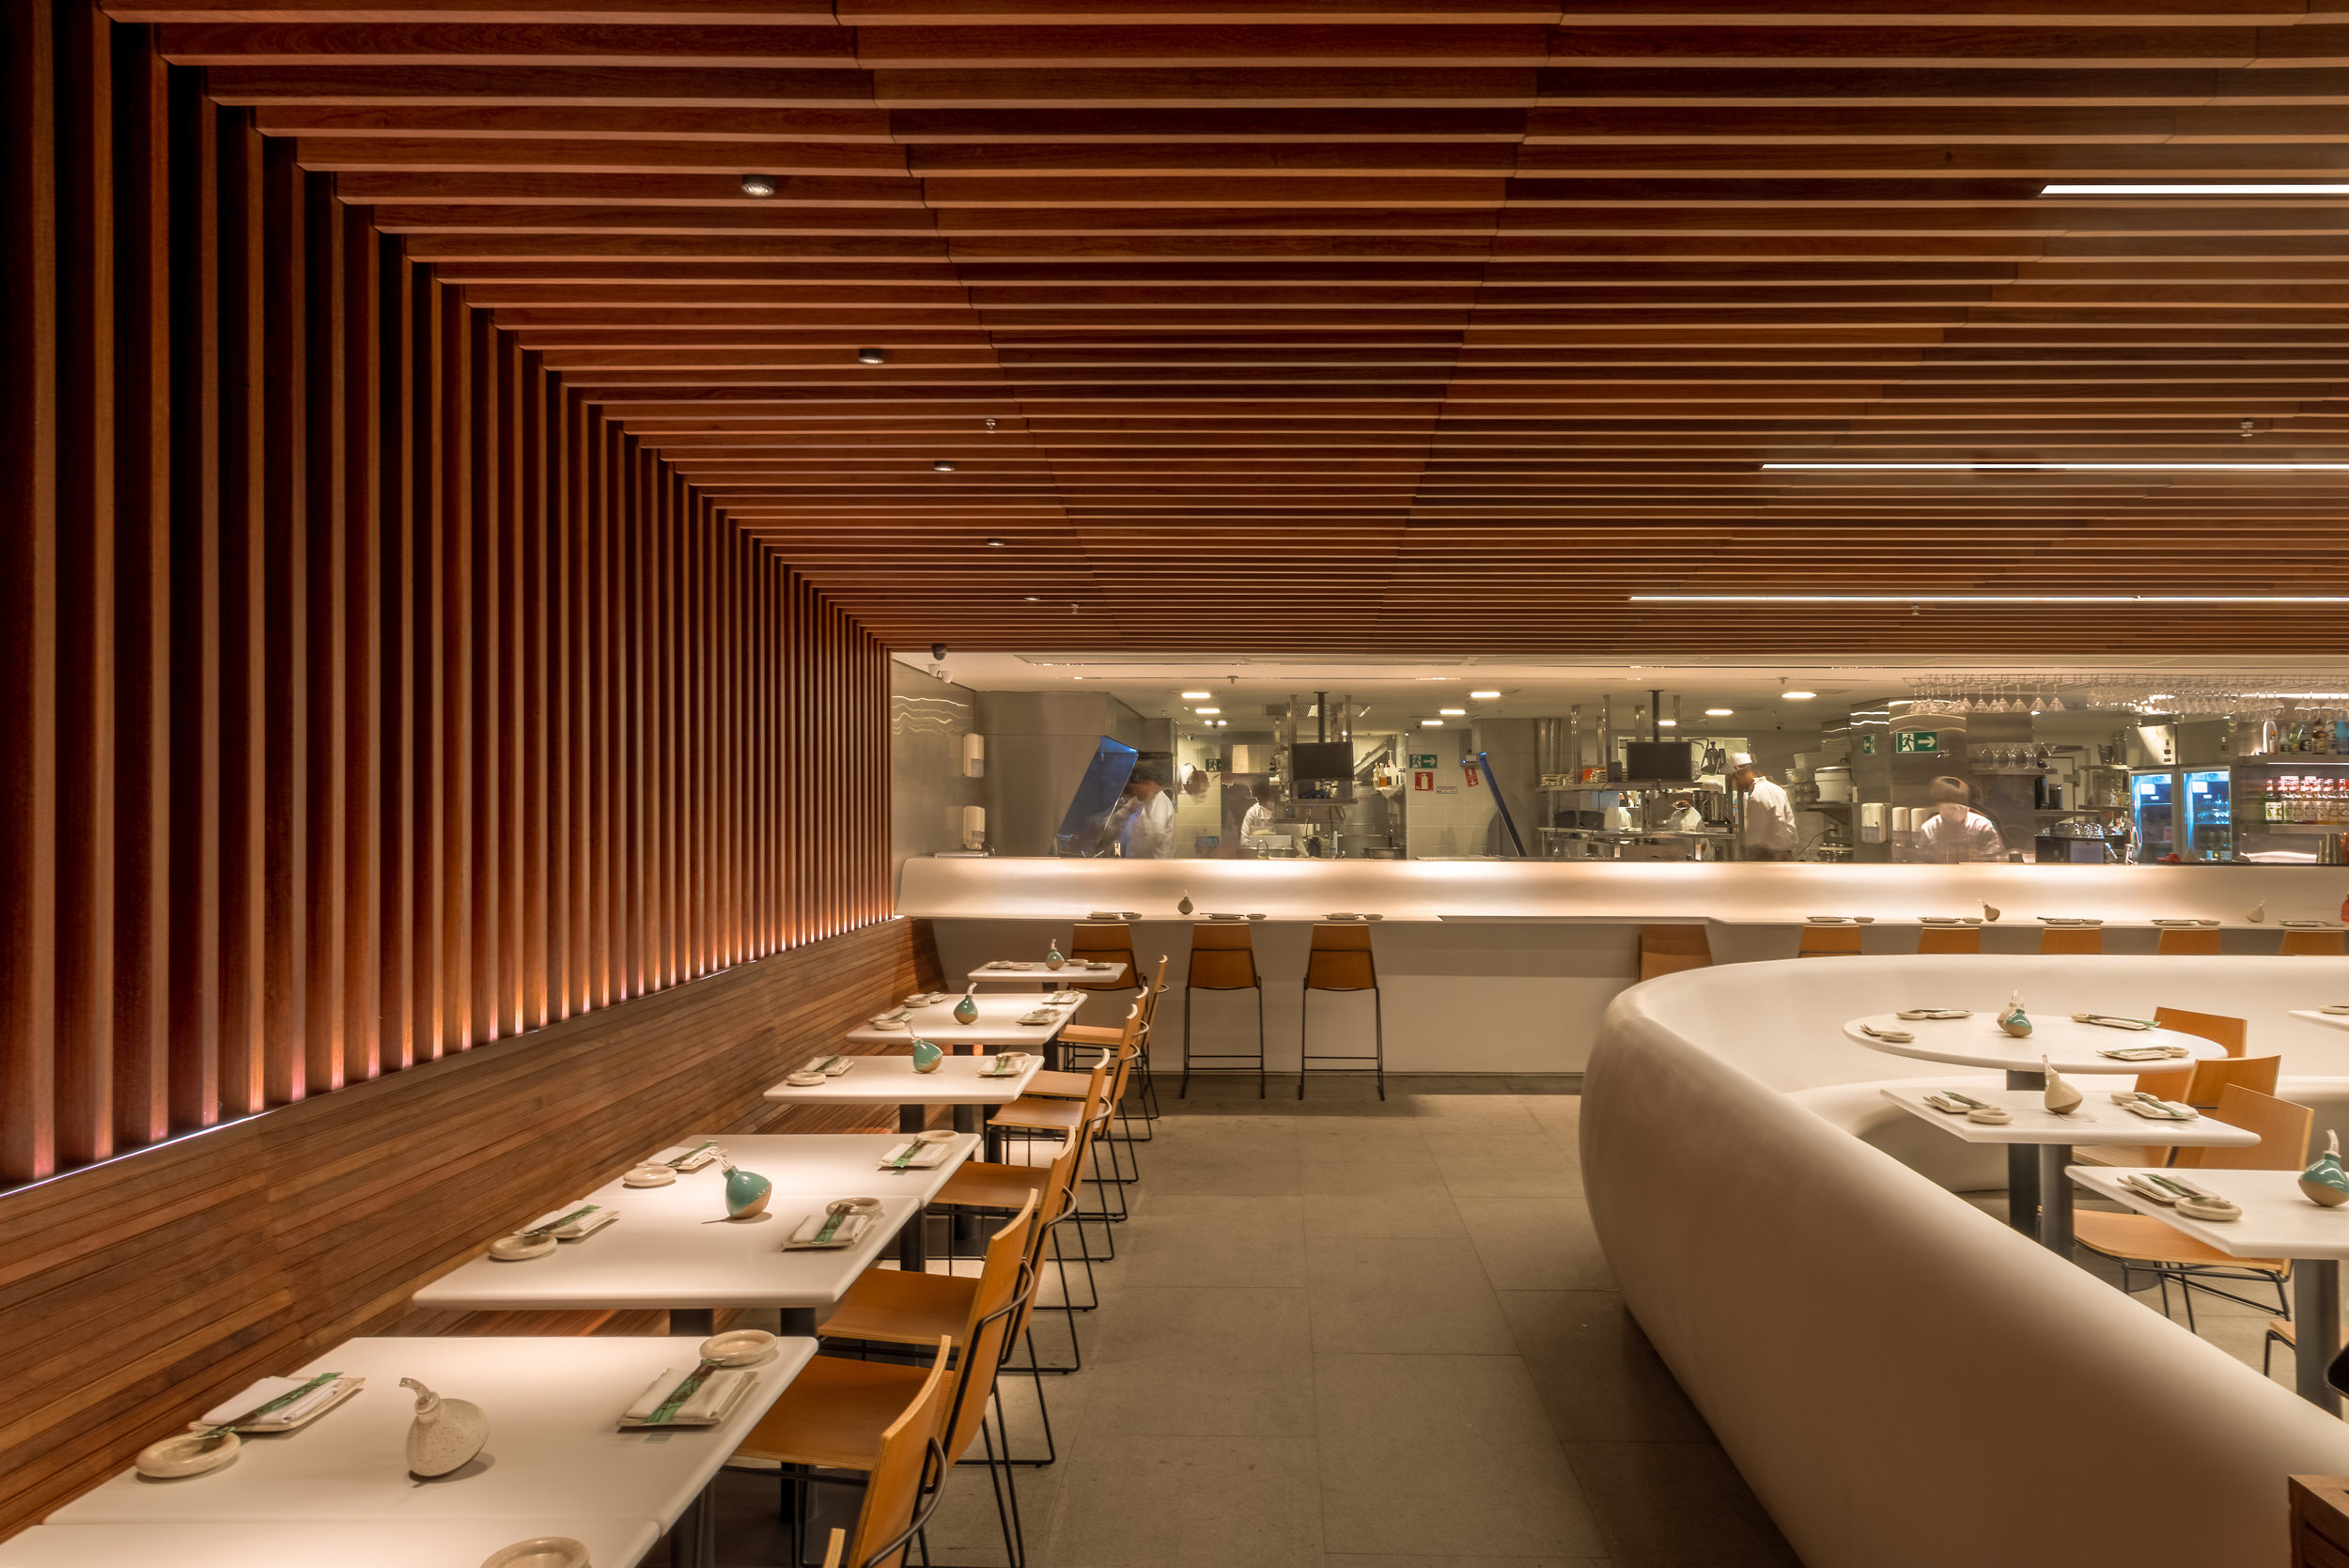 LIGHTSOURCE_Restaurante-Gurume-2019_Bernardes-Arquitetura_Studio-iluz_014.jpg